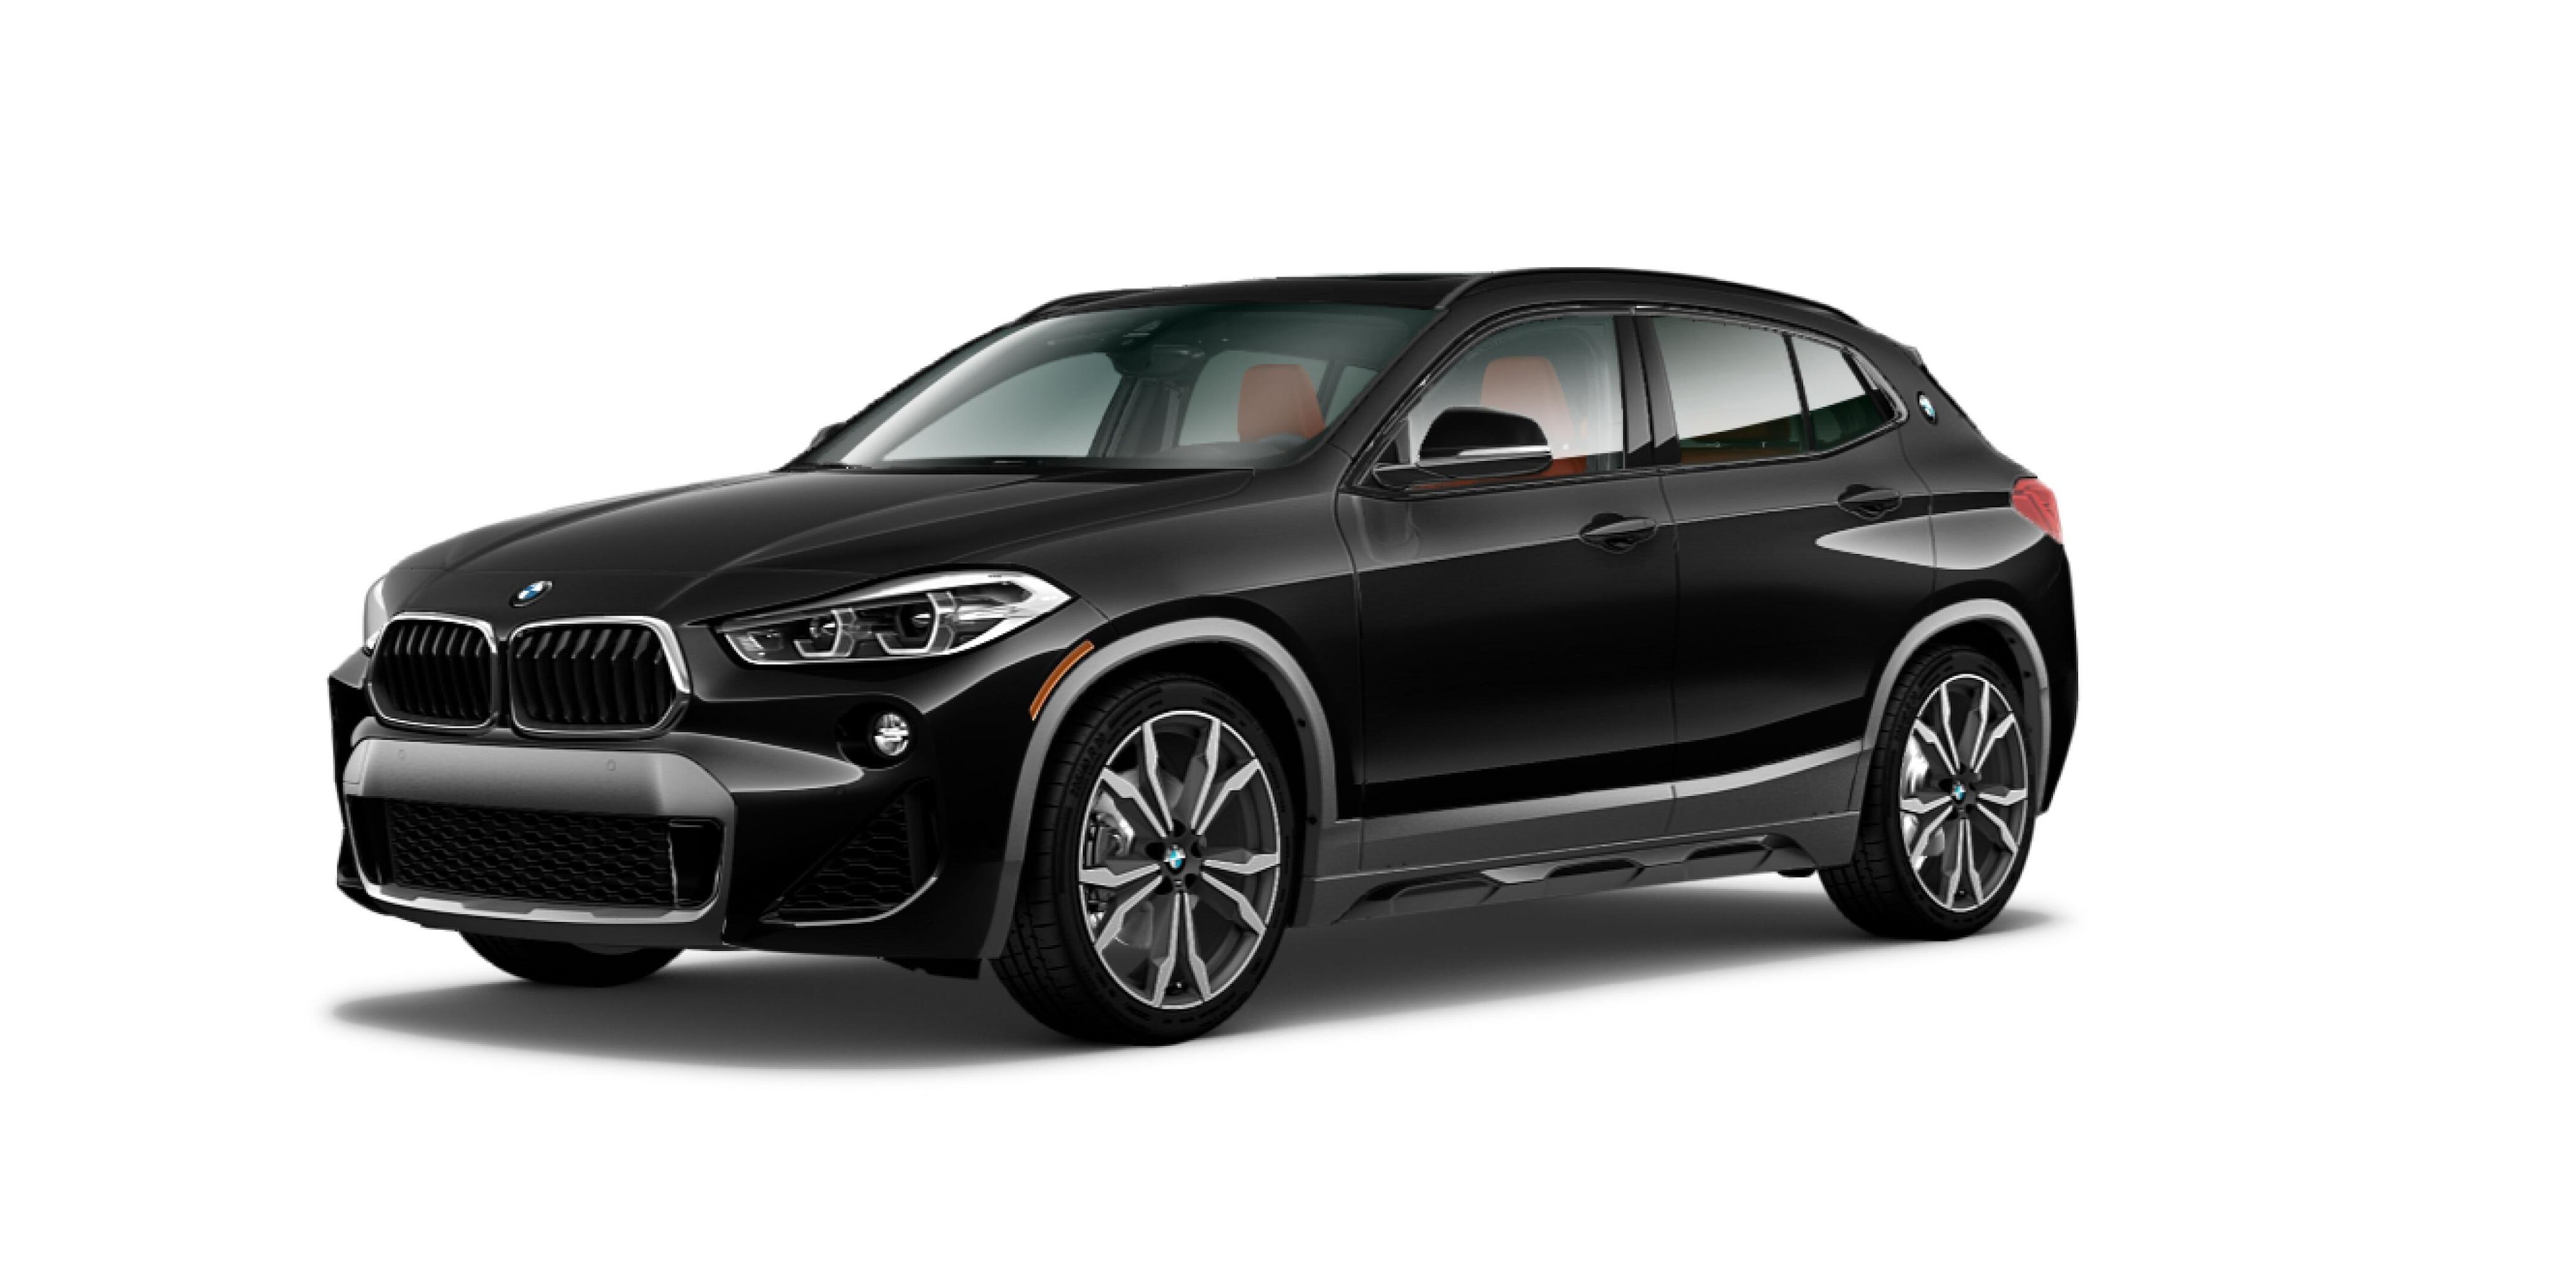 2019 BMW X2 SUV